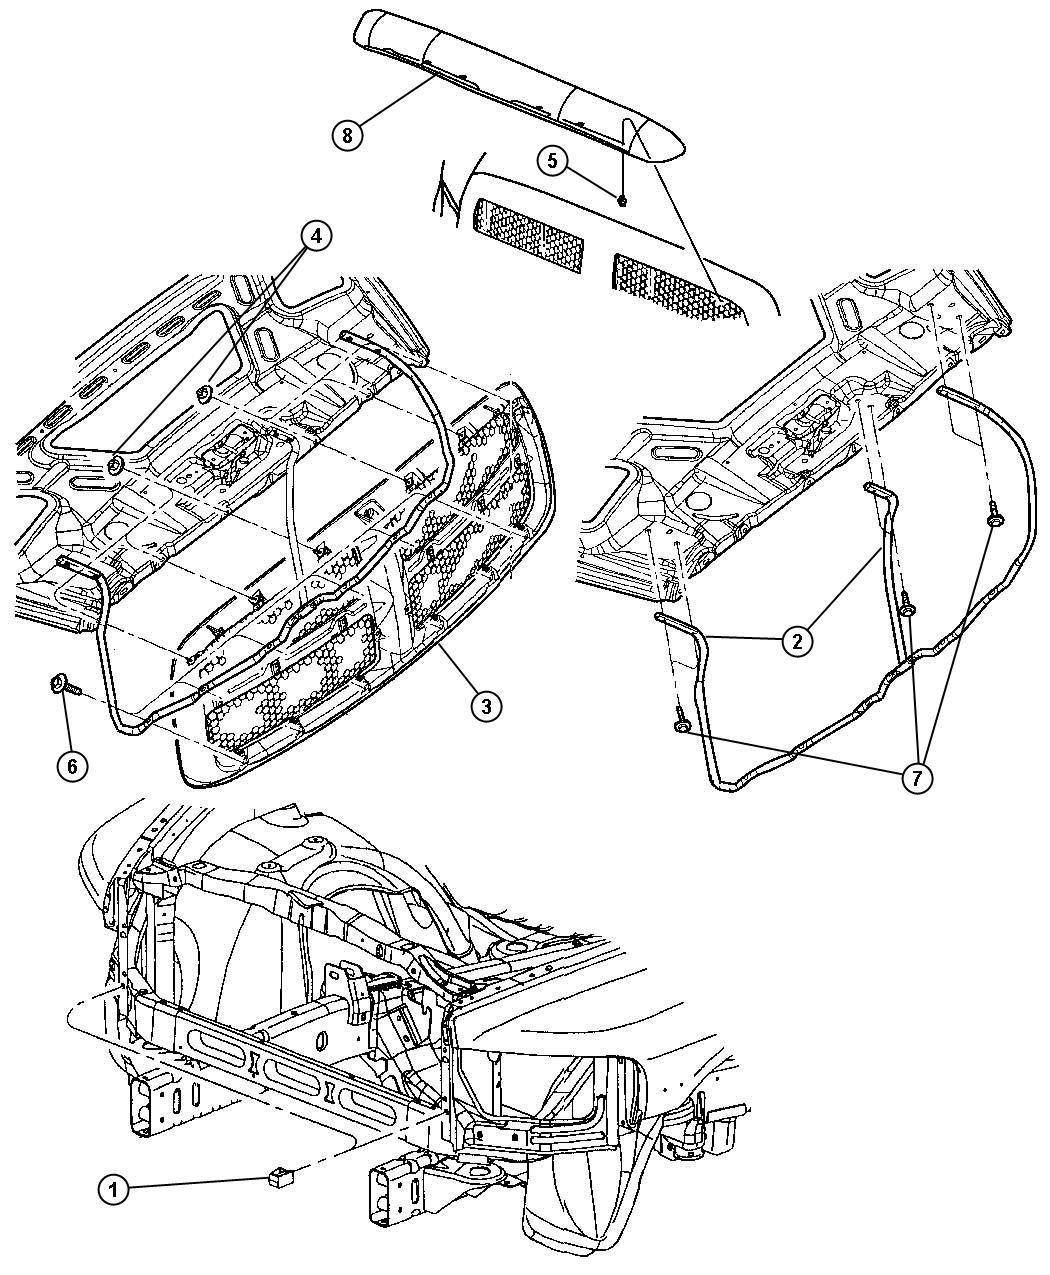 Dodge Ram 1500 Bracket. Radiator grille. Related, mopar